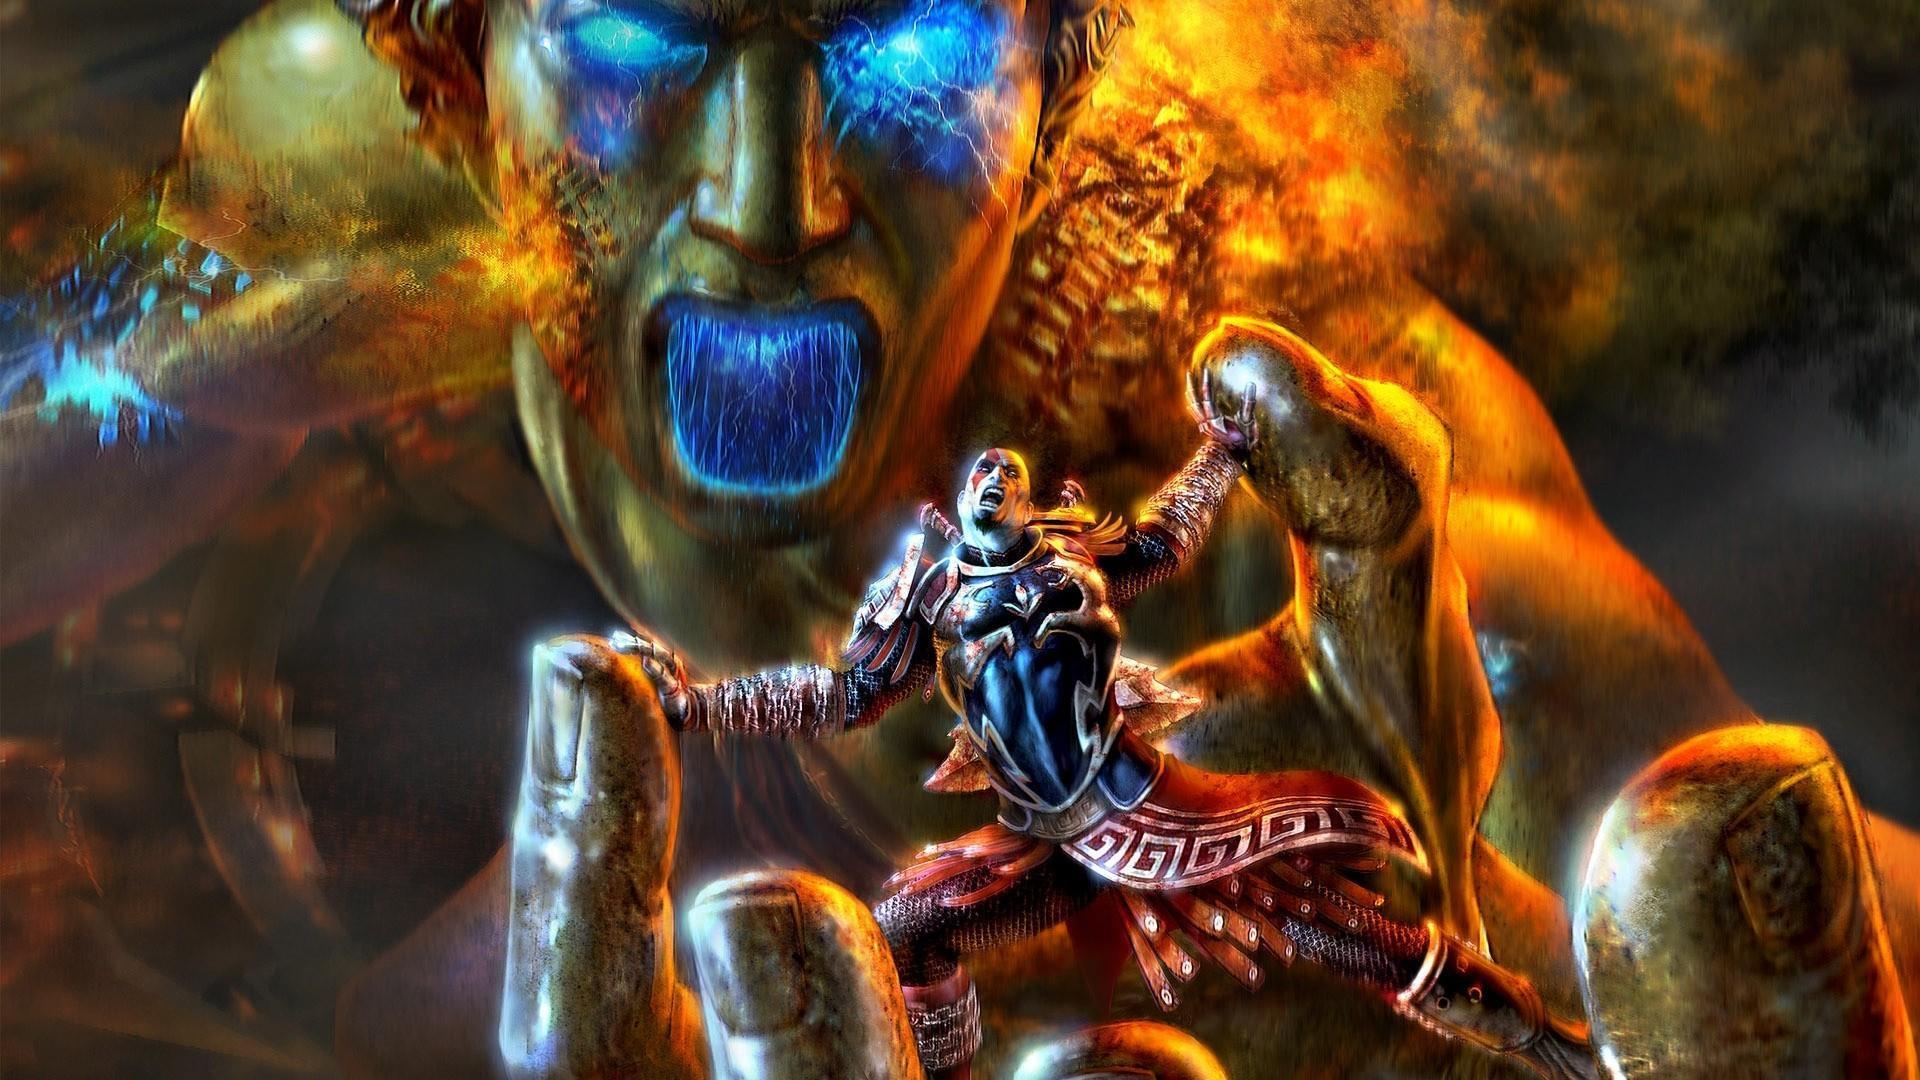 God Of War Game Wallpapers - Wallpaper Cave